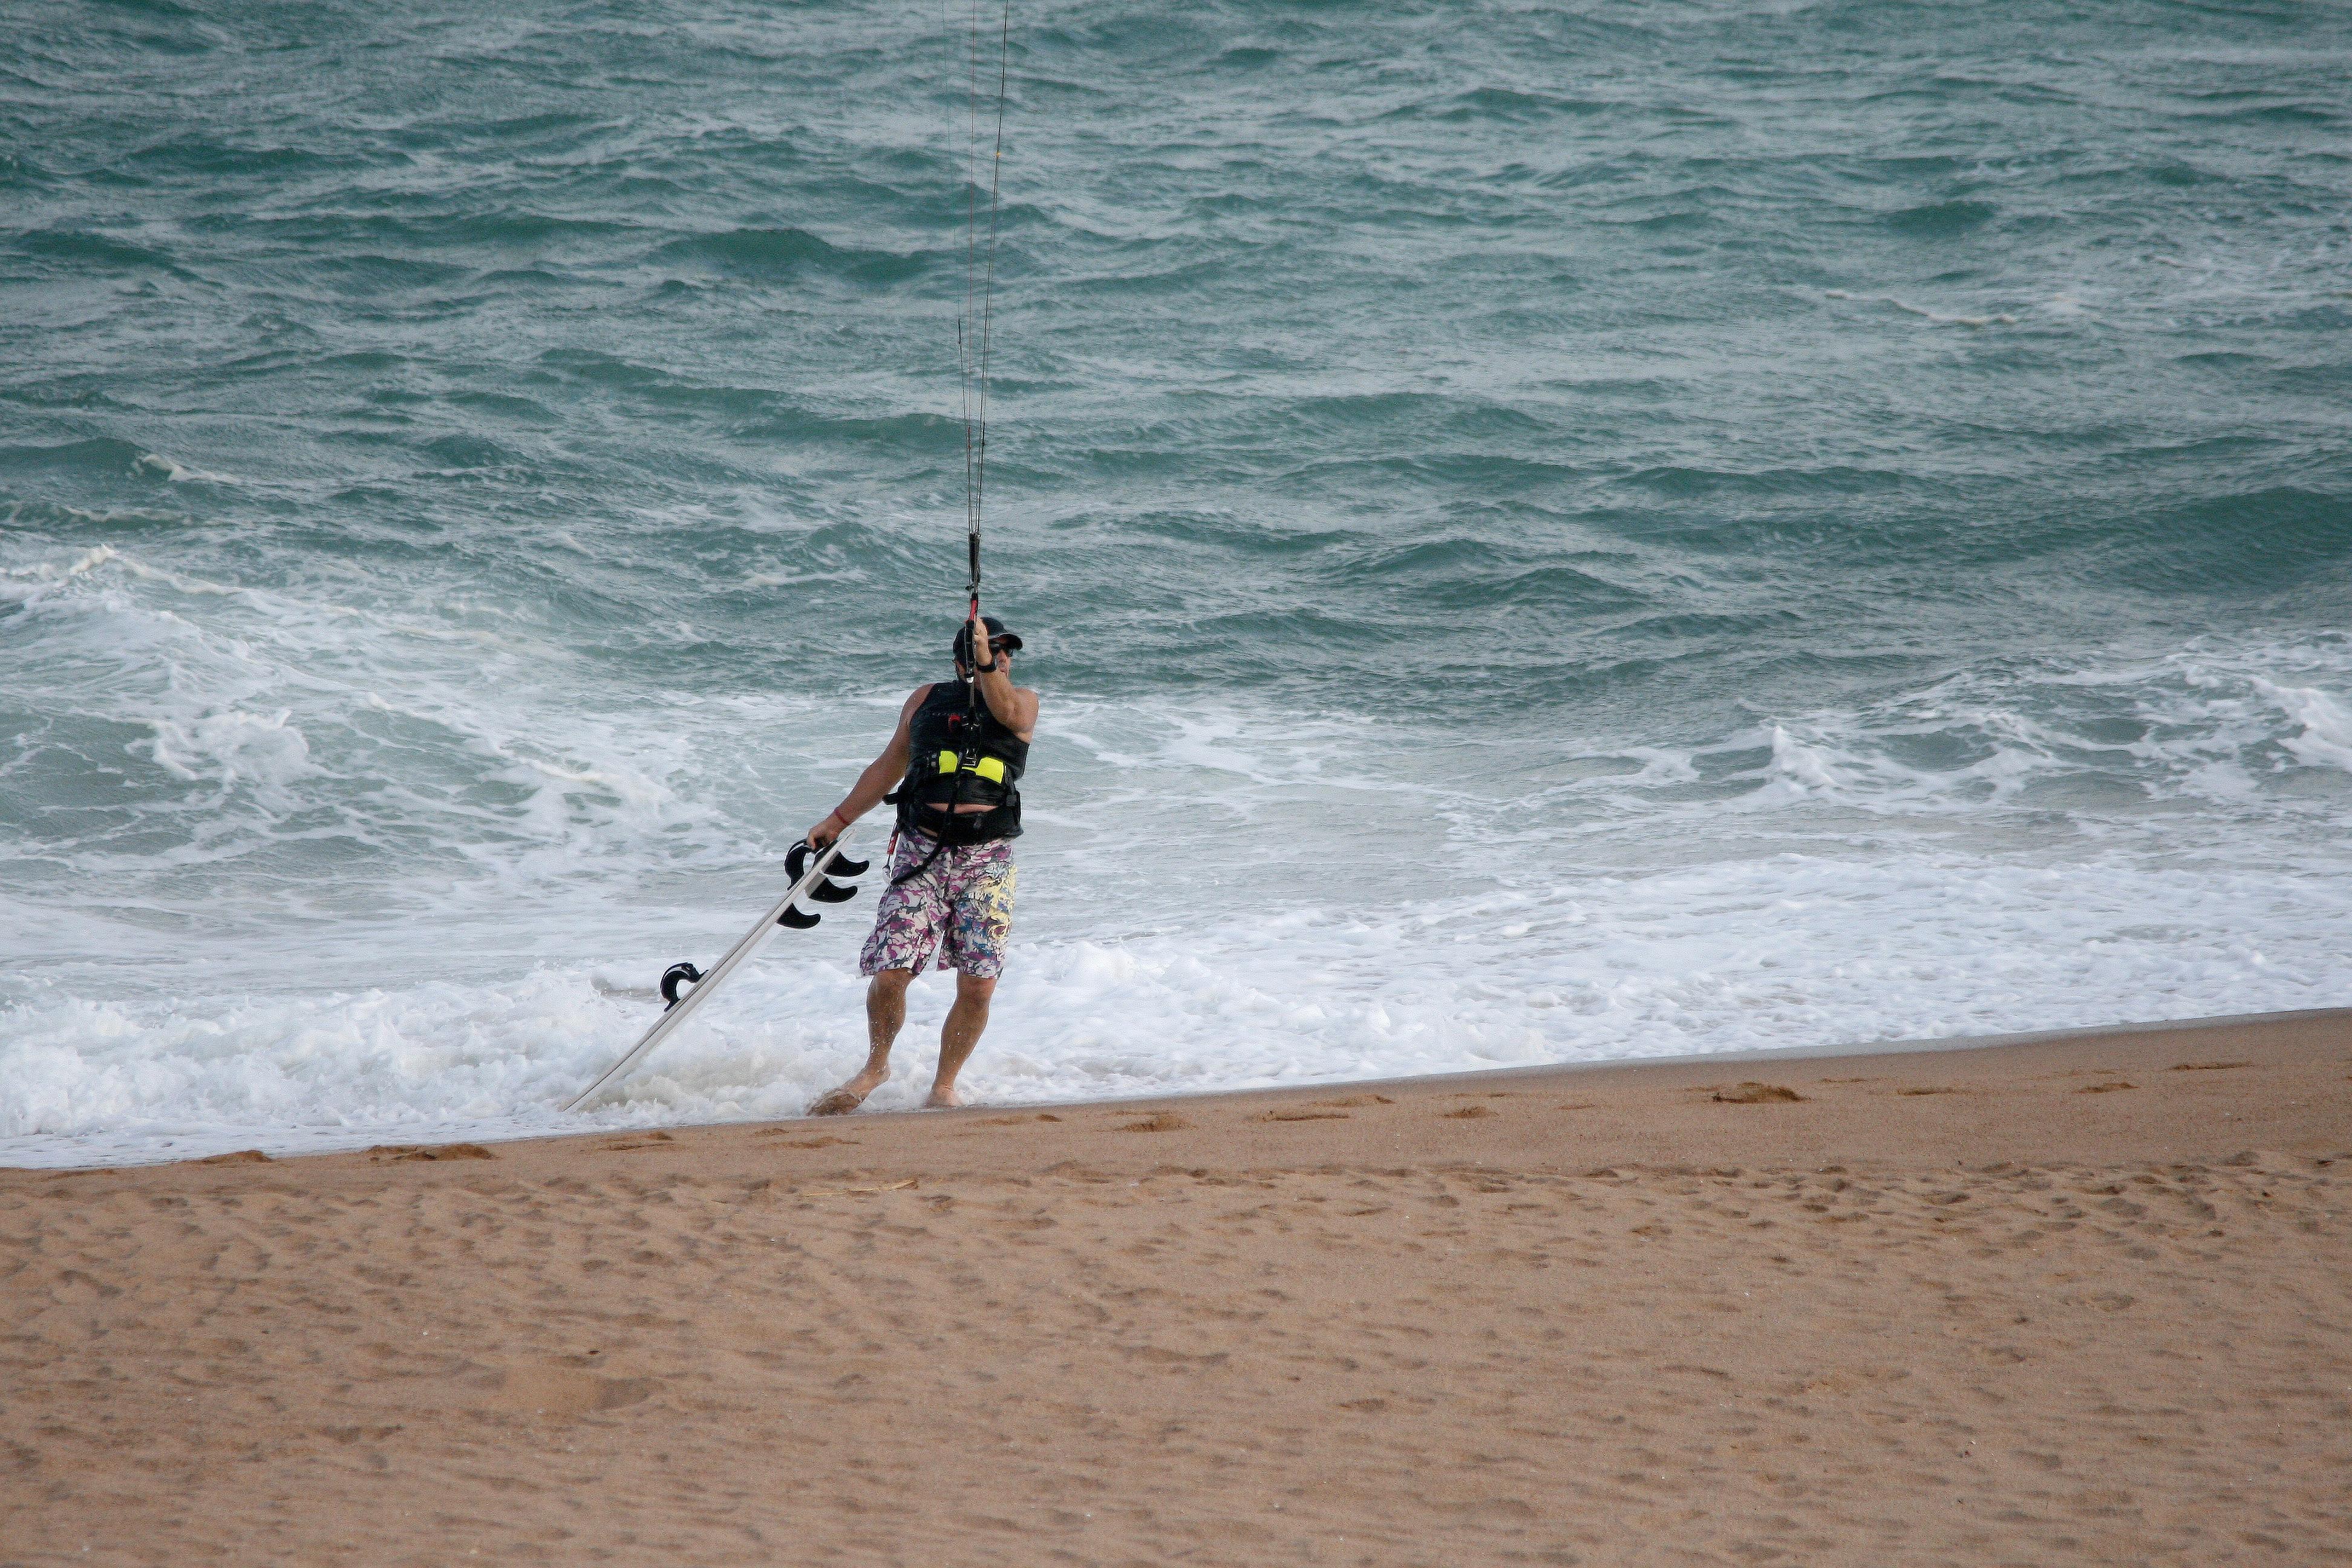 Free Images : man, sea, coast, sand, ocean, board, rigging